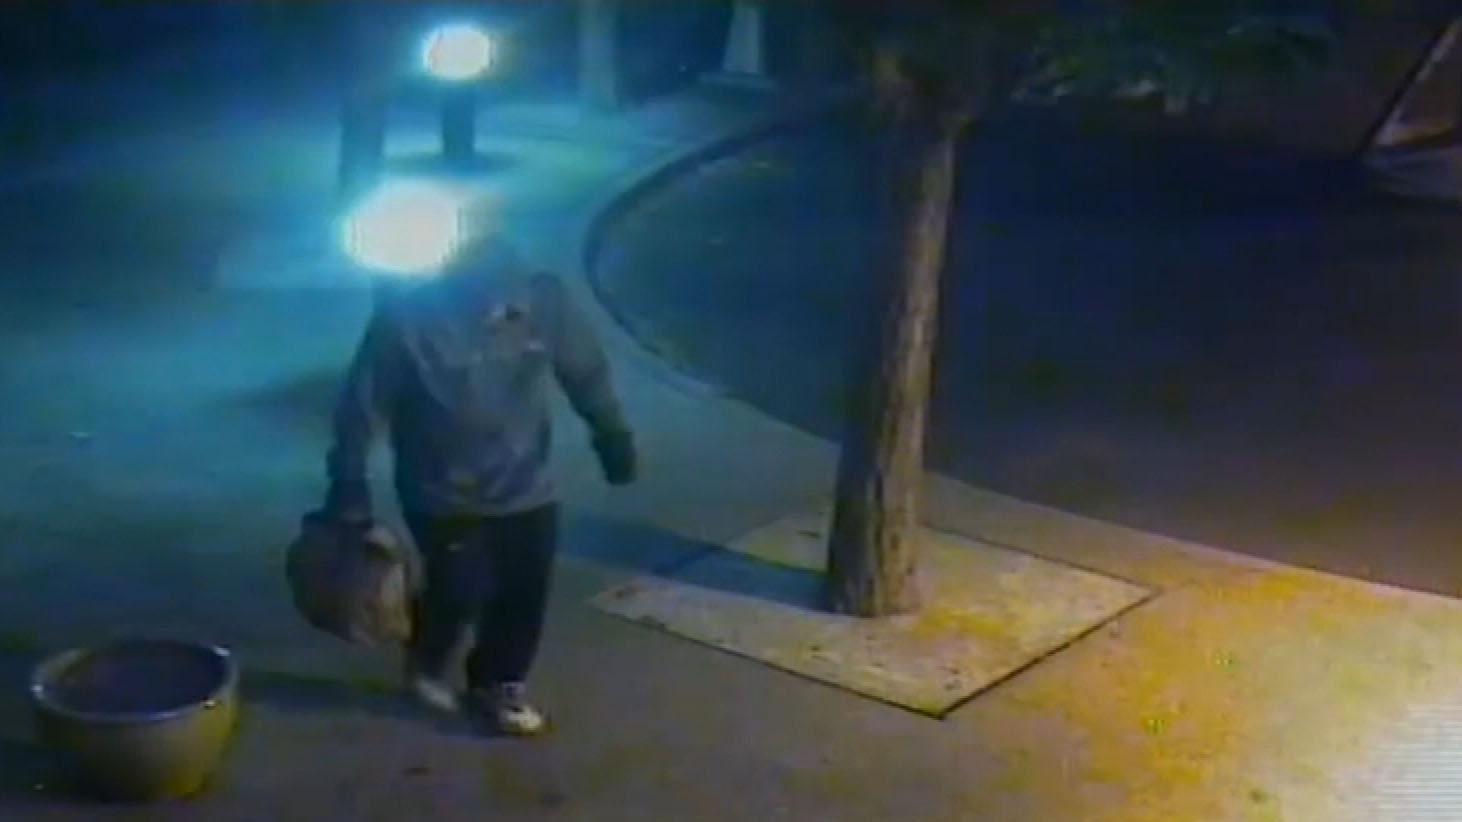 Man leaves suspicious device outside Melbourne court